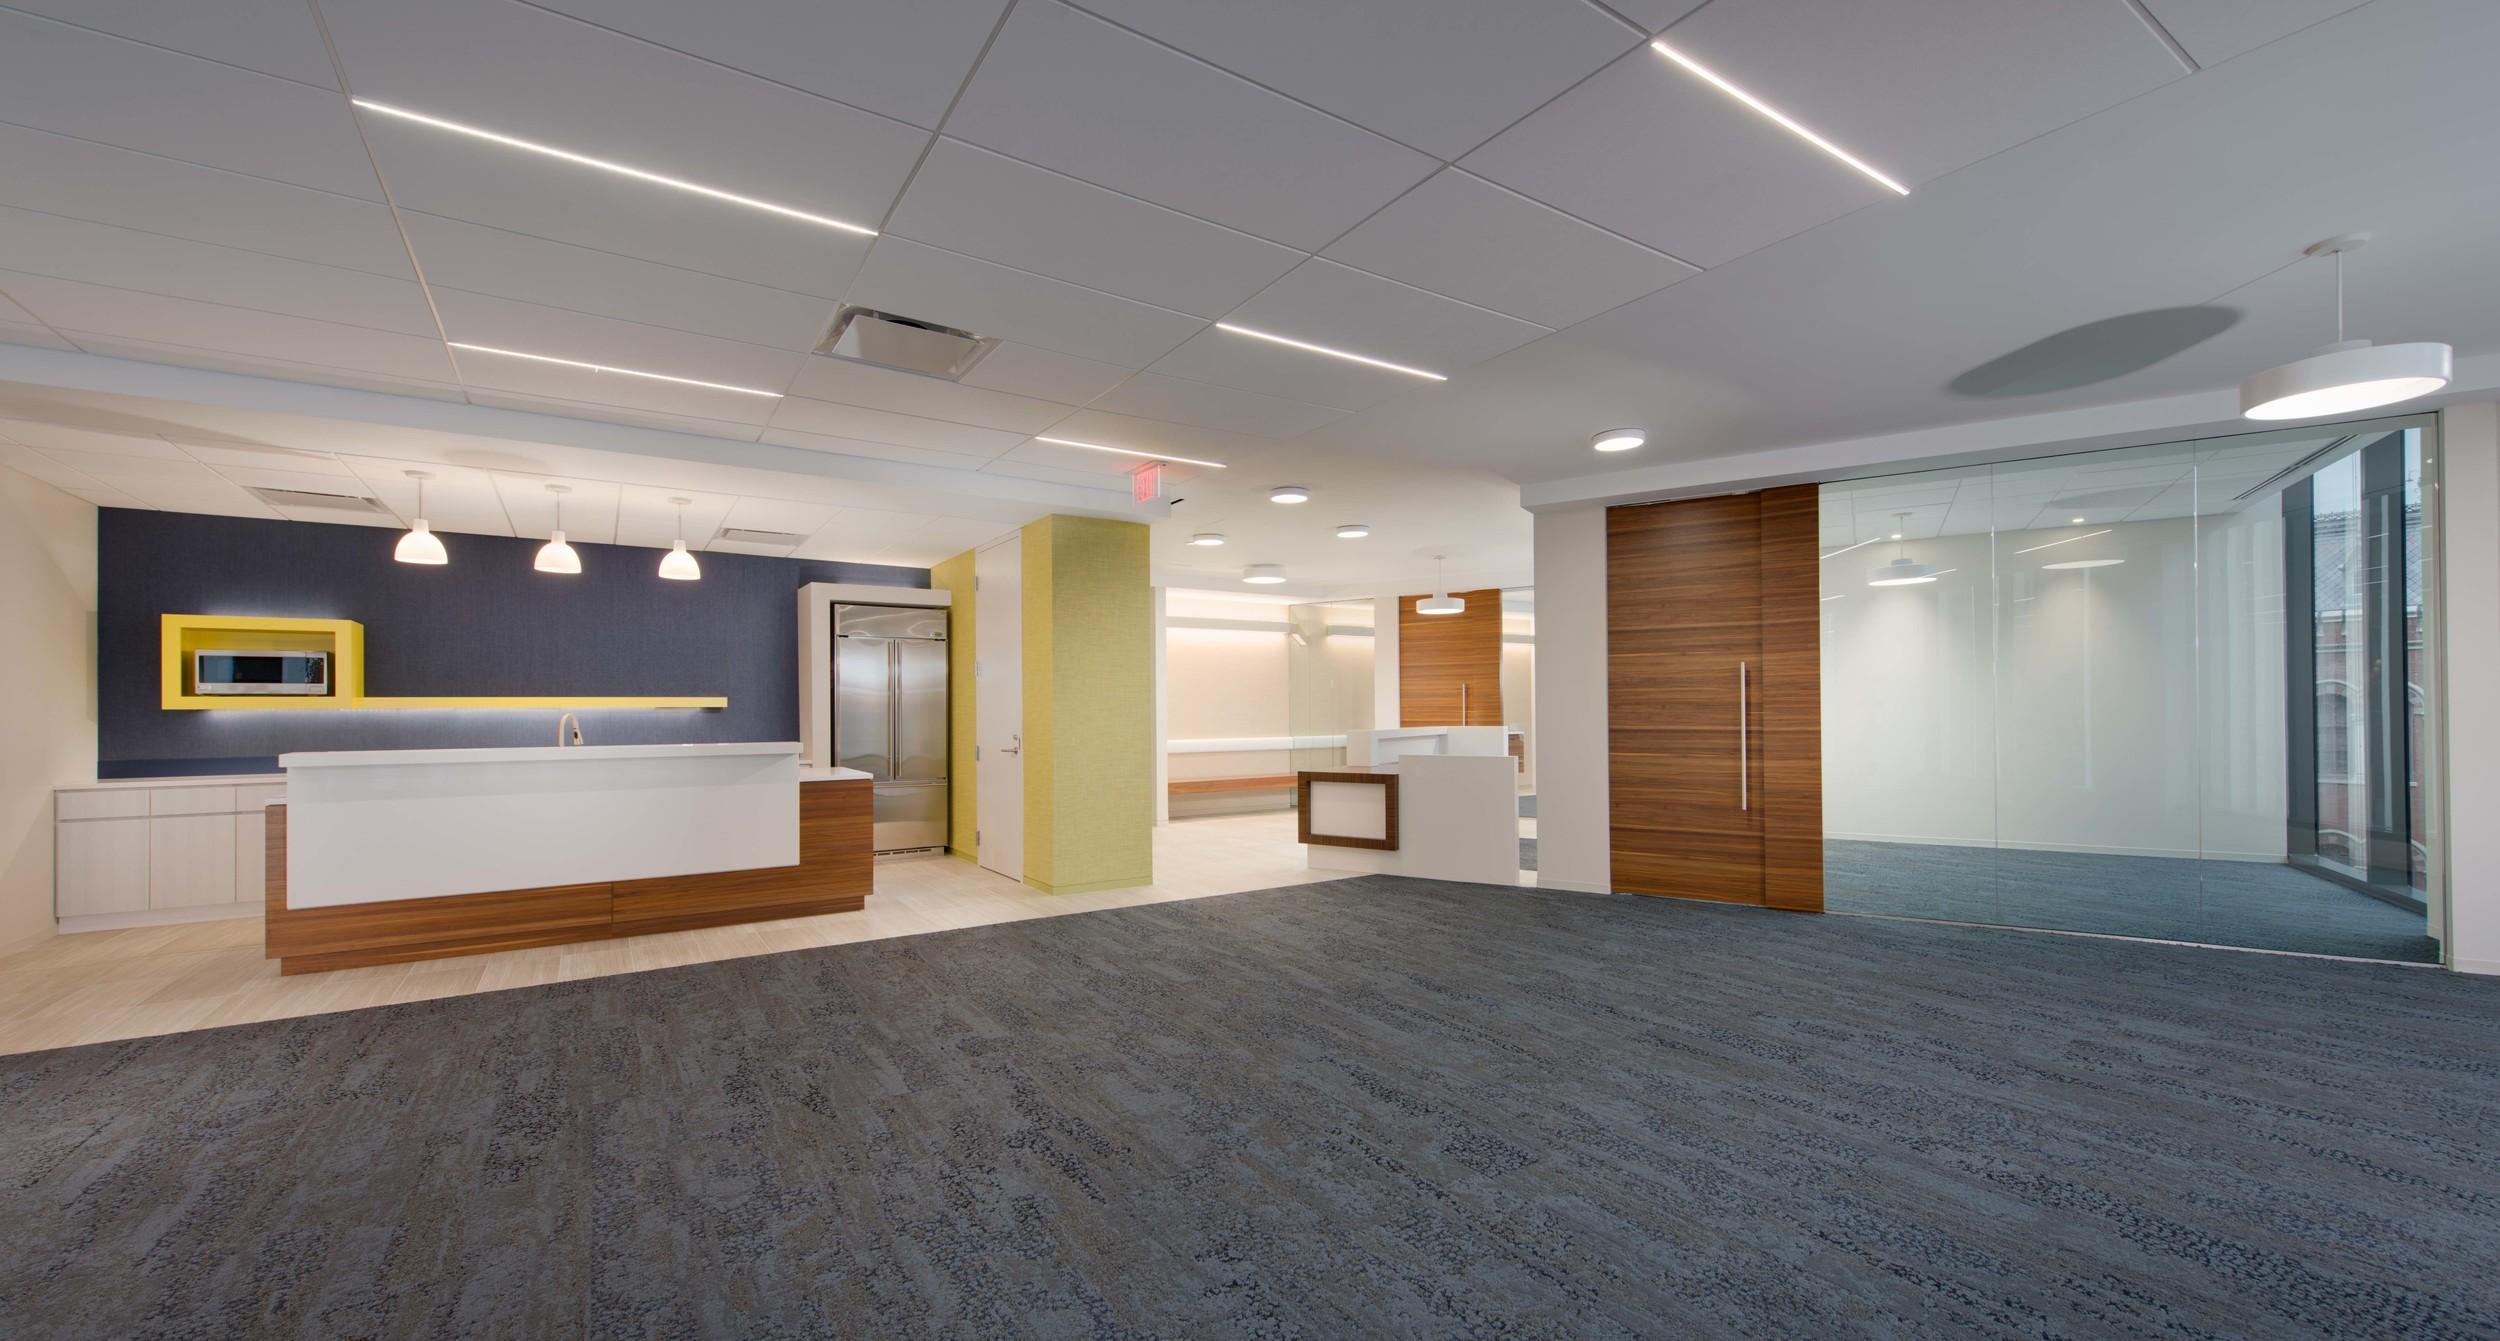 1200 17th Office Suite Interior Image 216387.jpg